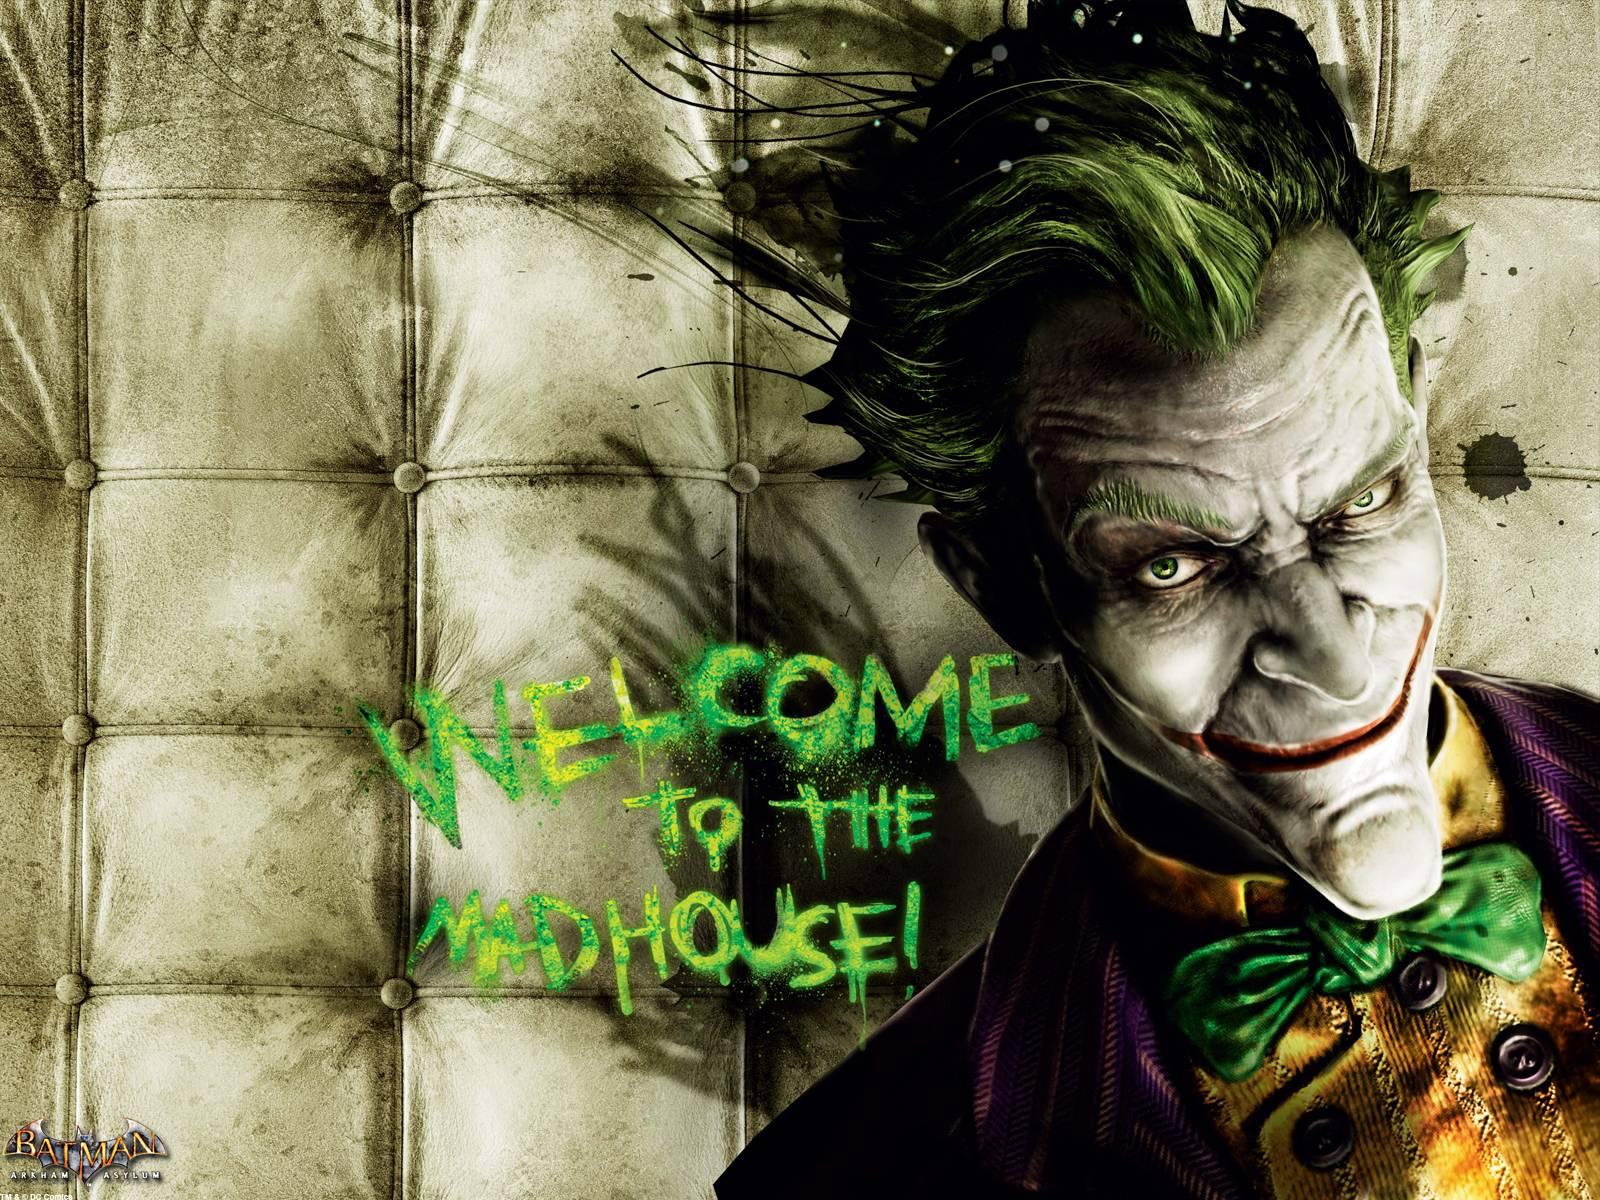 image batman arkham asylum joker wallpaper batman wiki